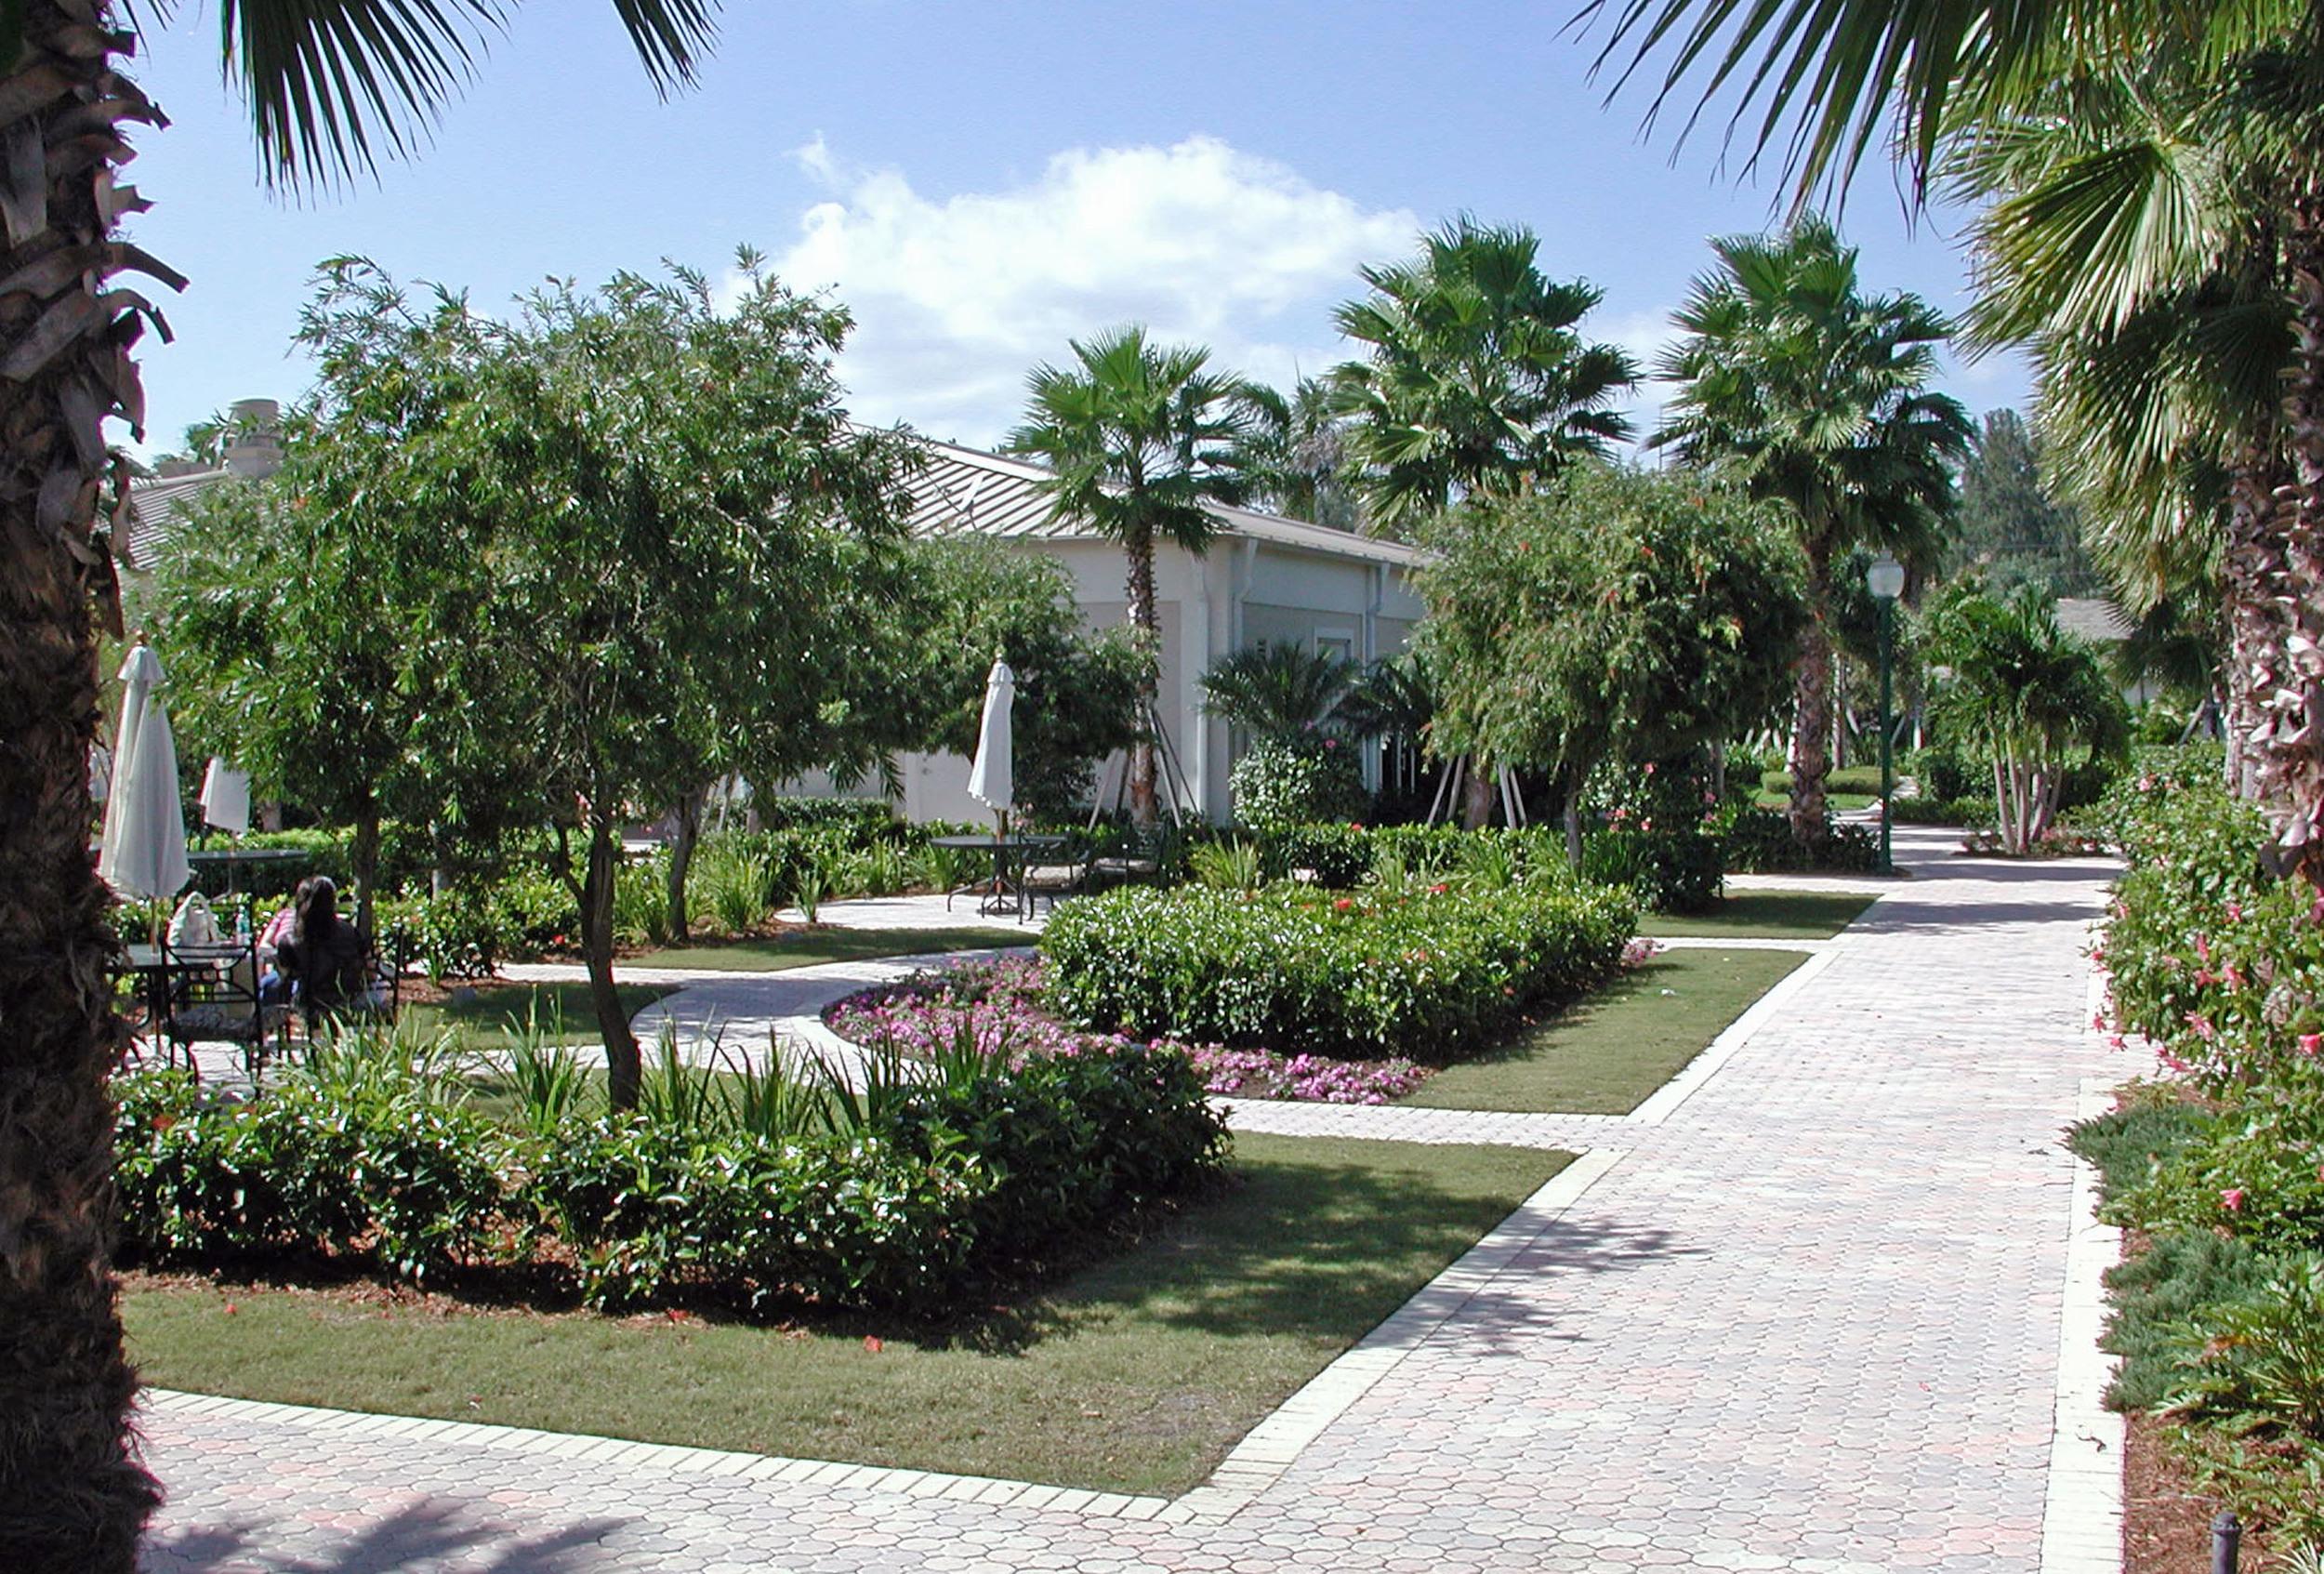 Gathering Courtyard at Christ Fellowship Church Landscaping PBG.jpg